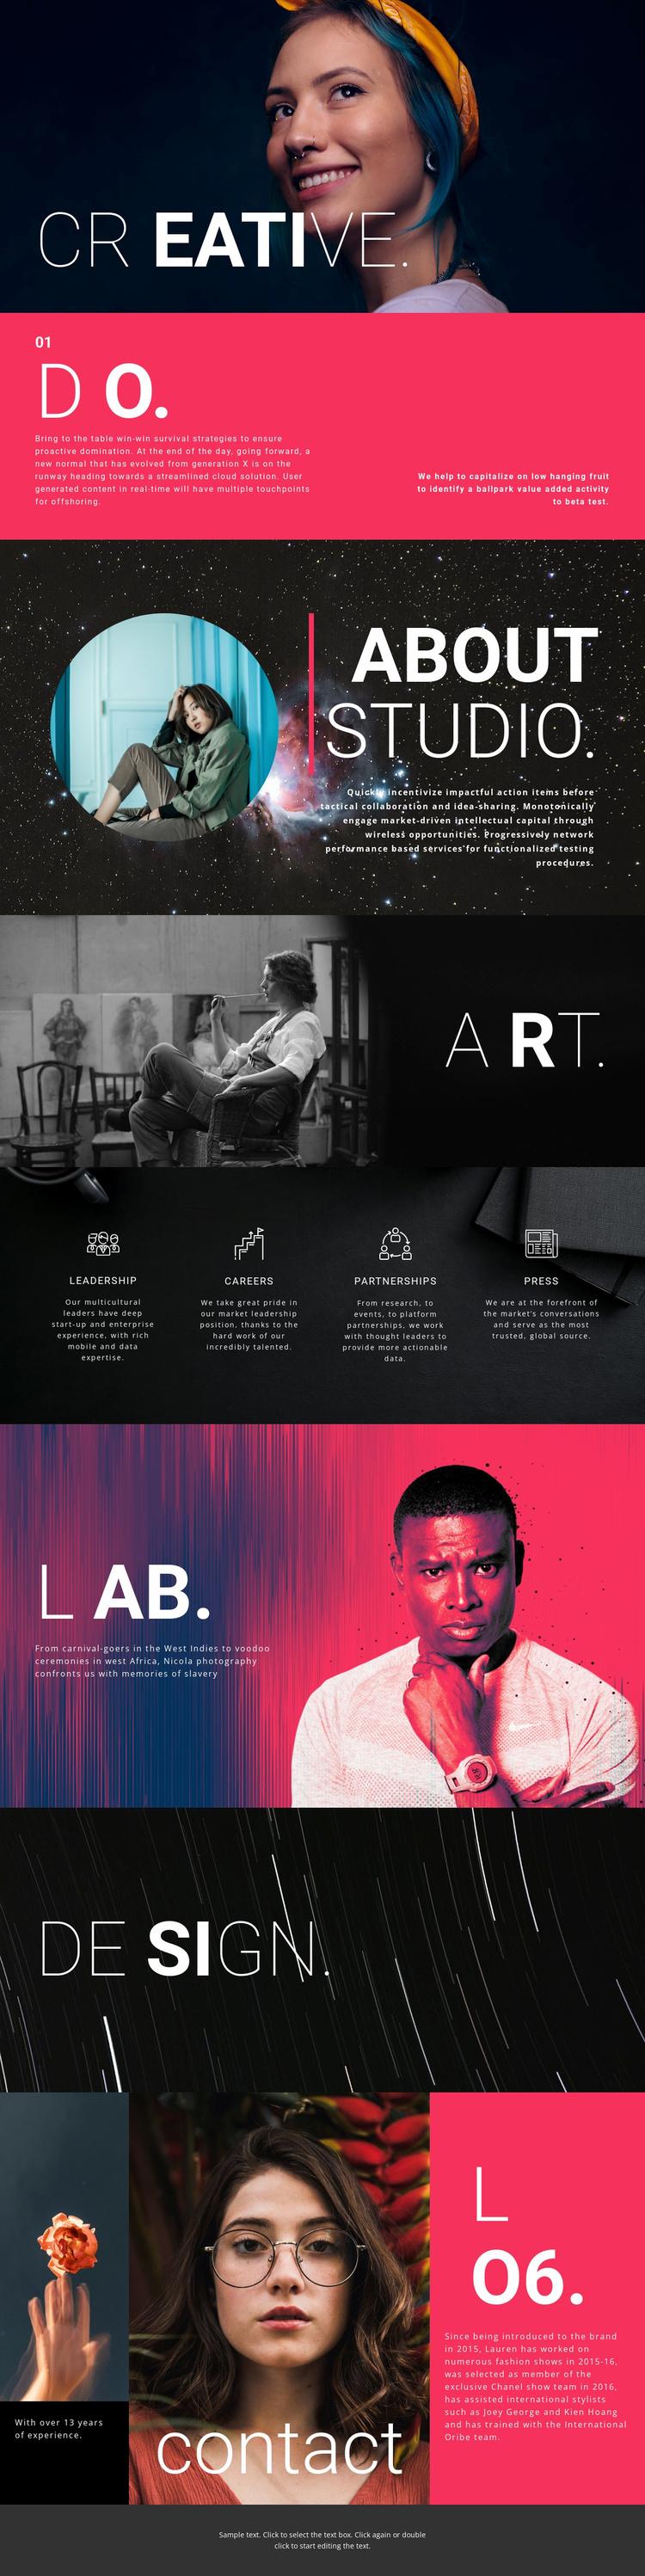 Creative design studio Landing Page